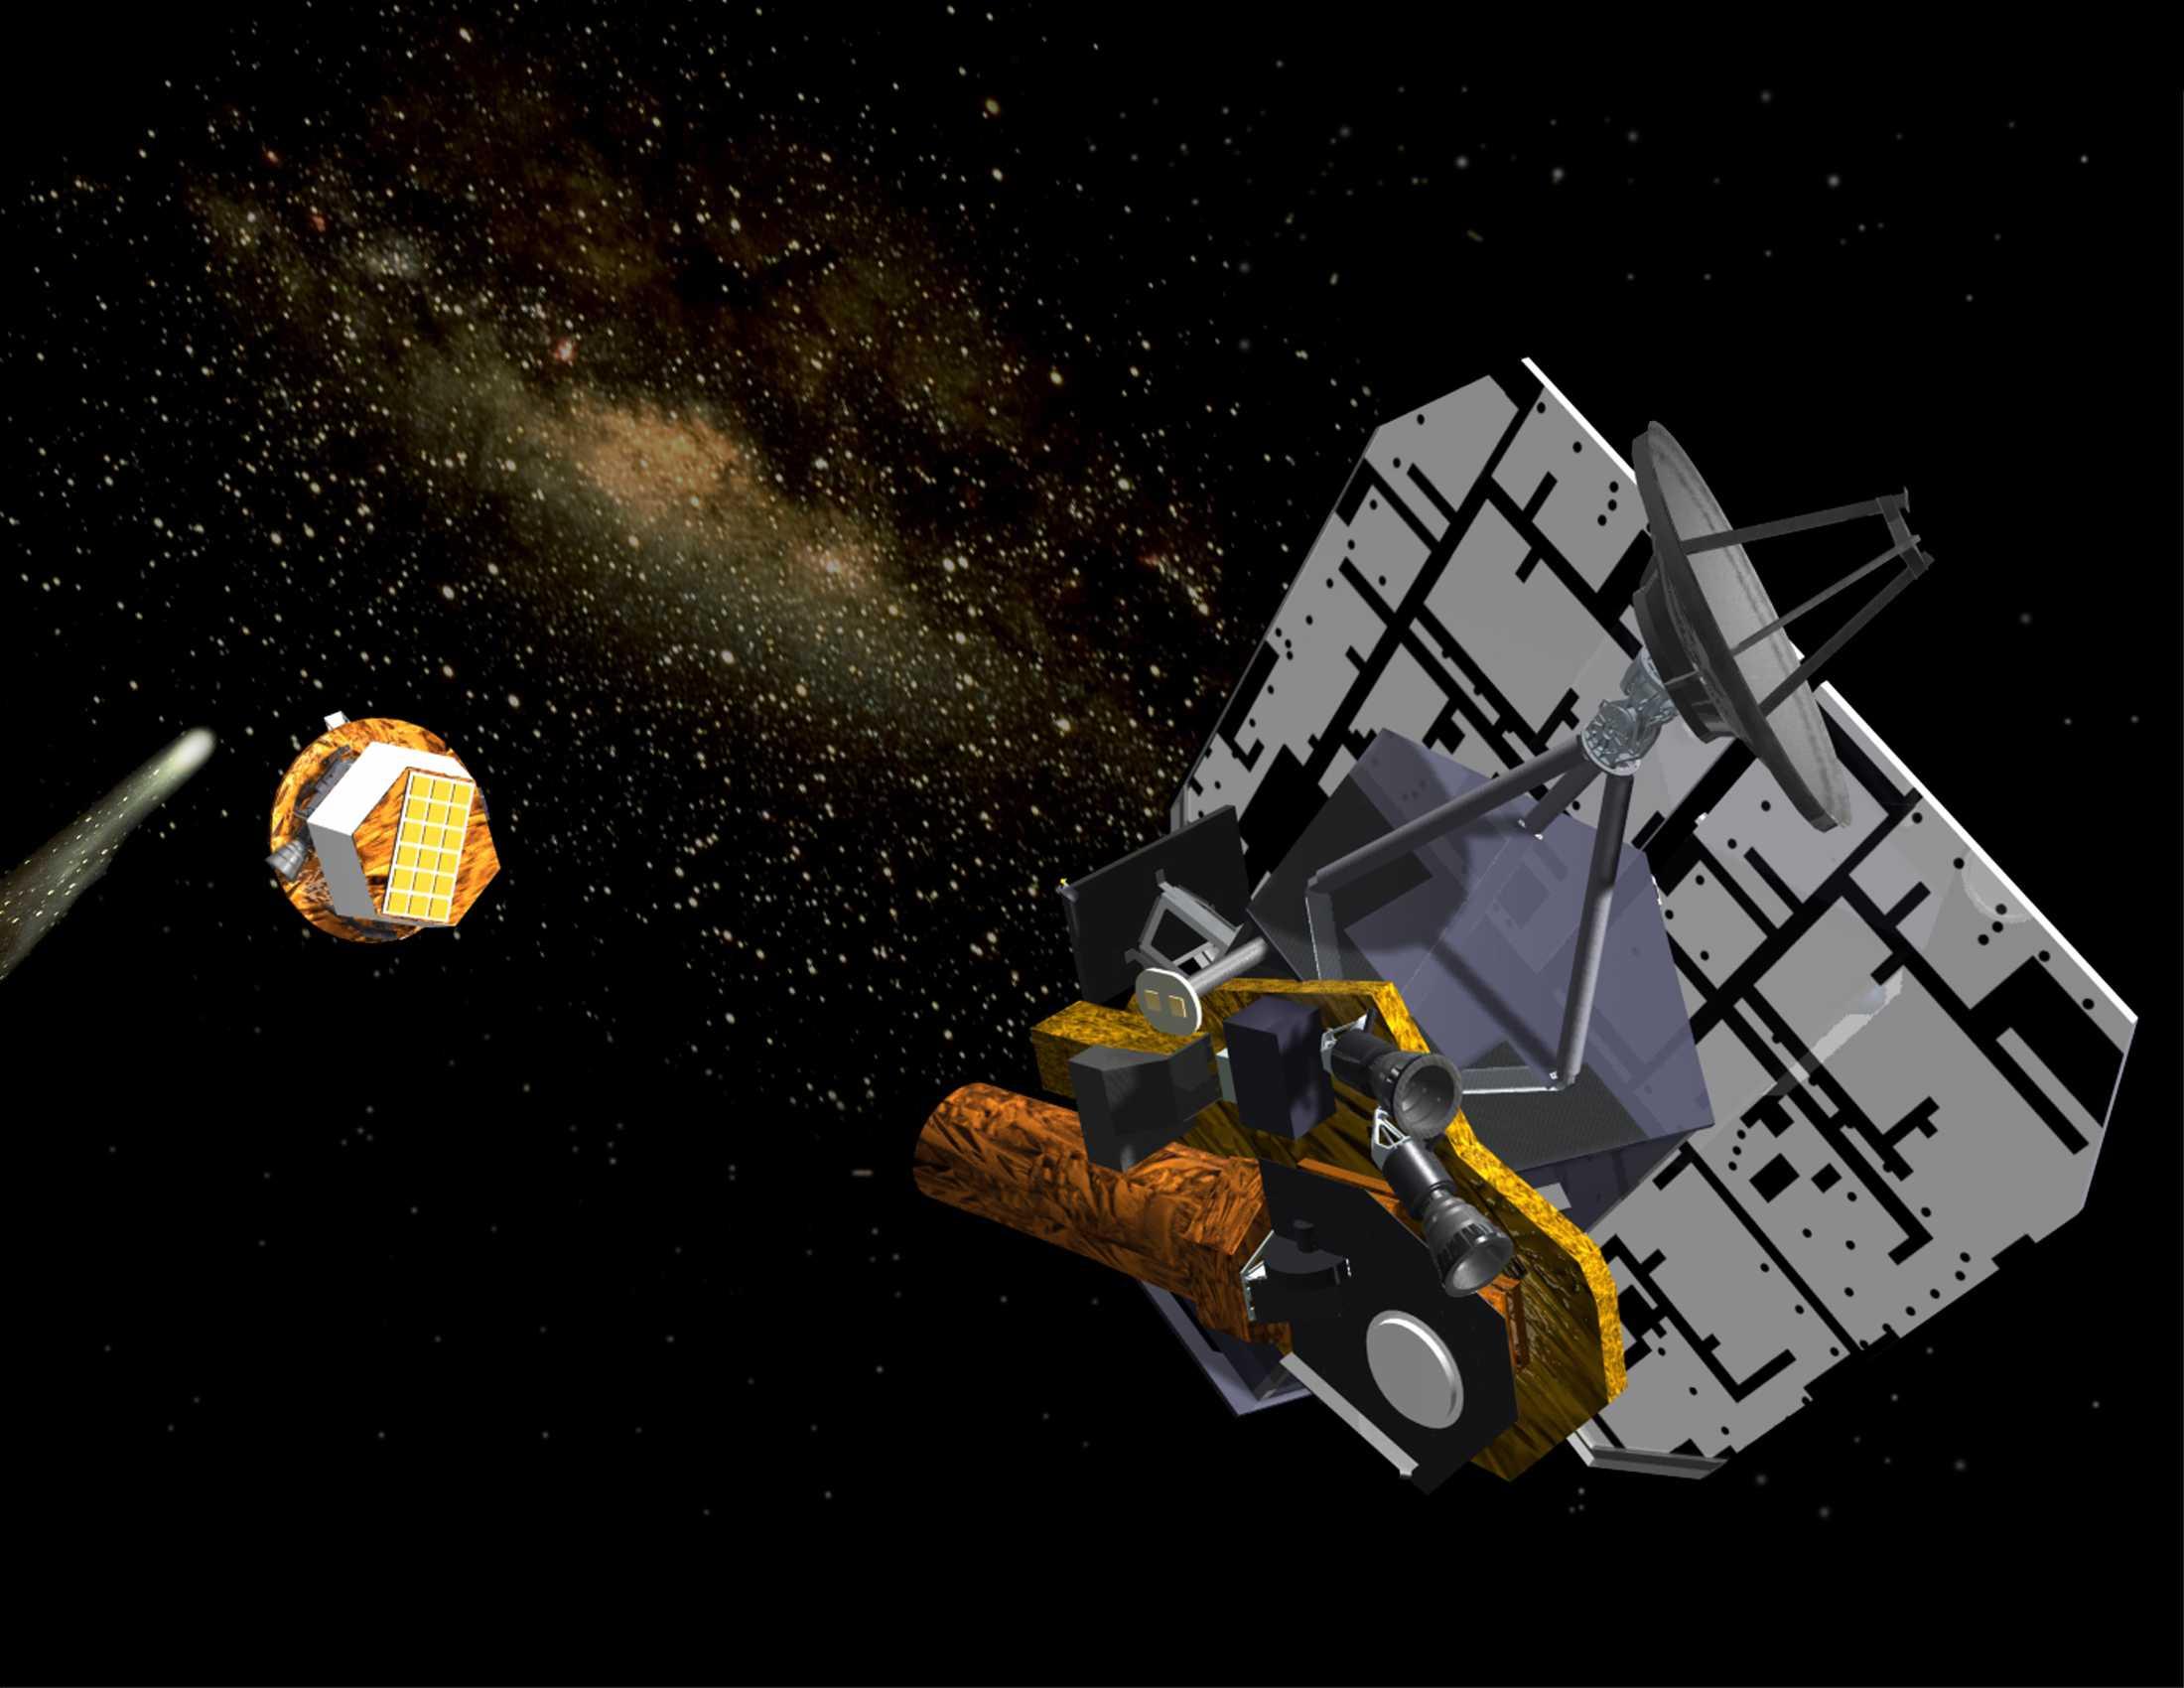 Impacto profundo (sonda espacial)